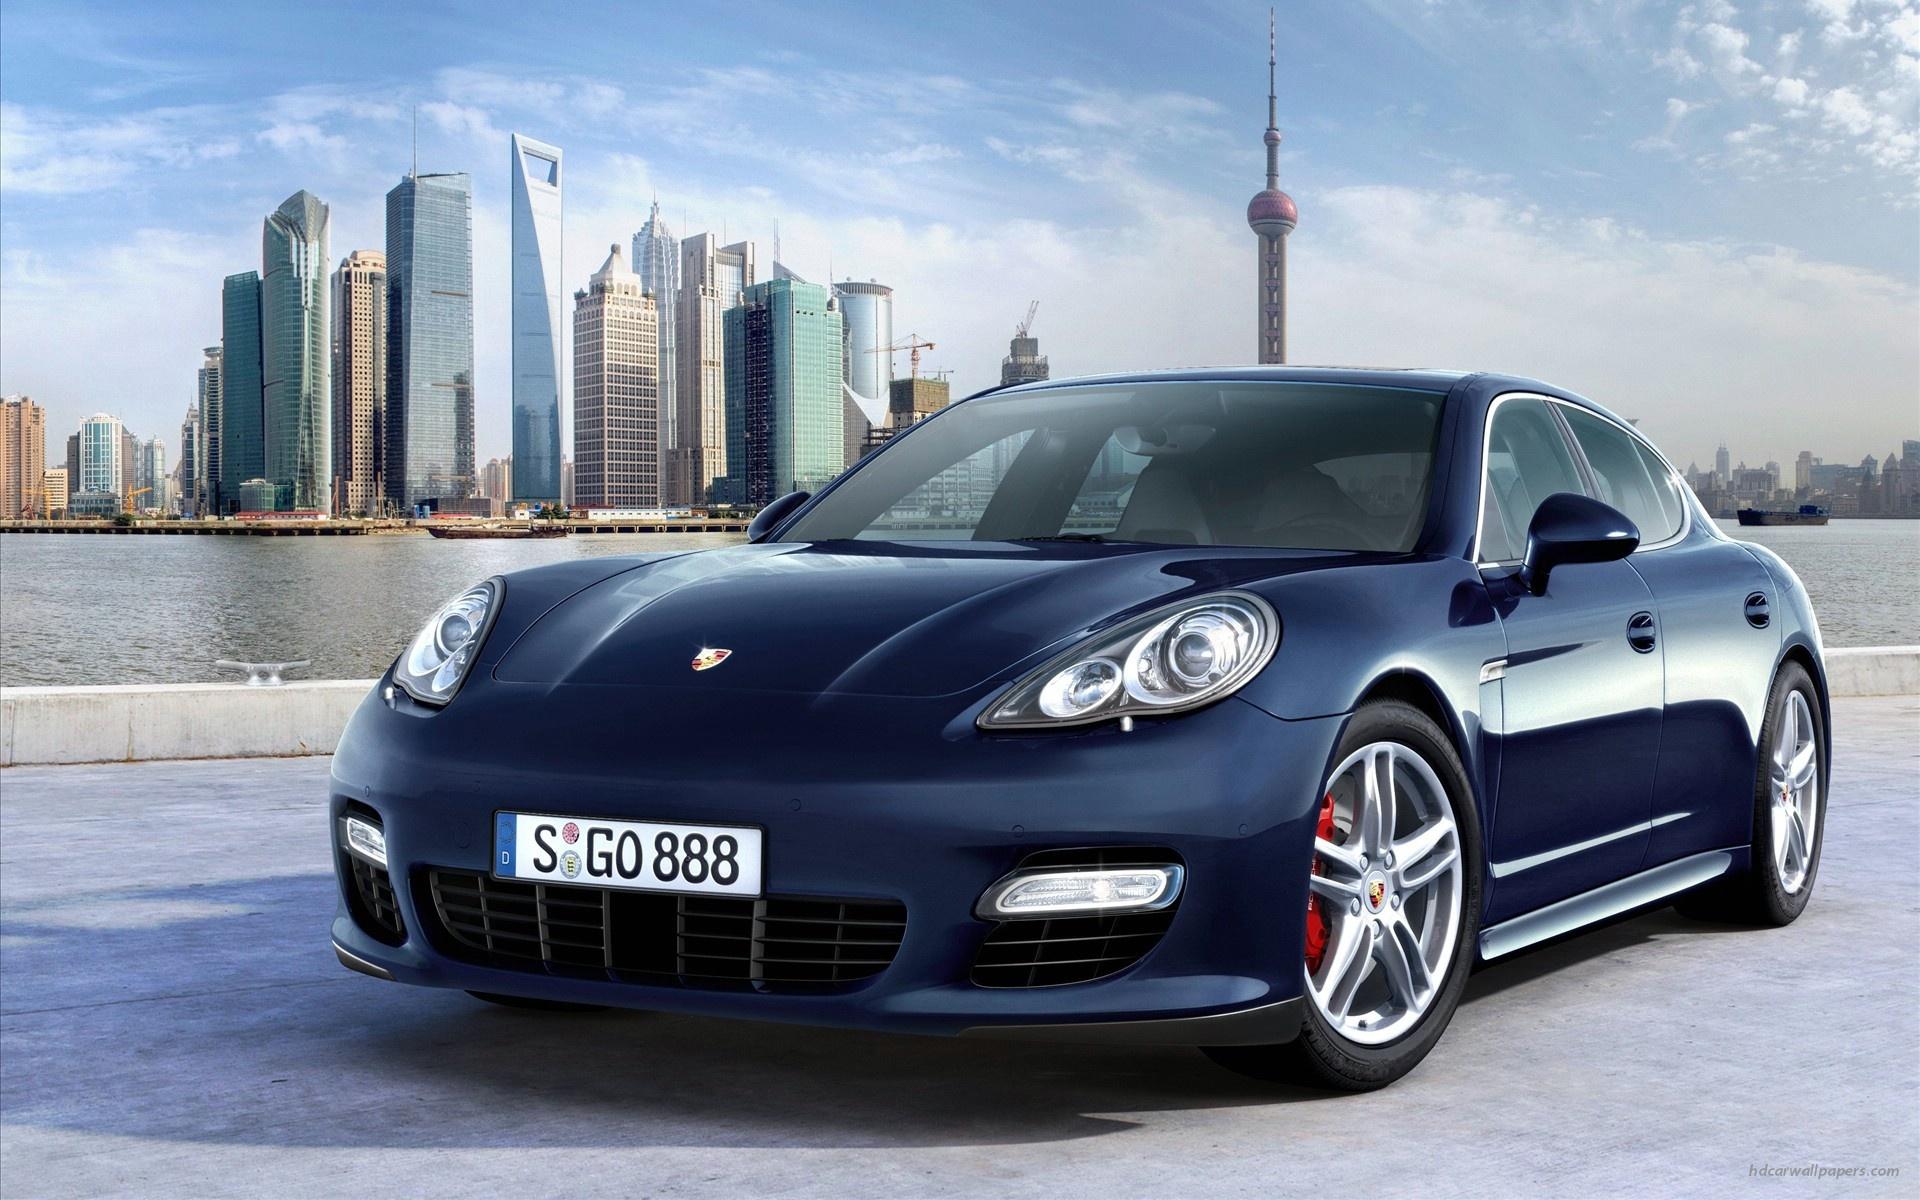 2010 Porsche Panamera 9 Wallpapers In Jpg Format For Free Download